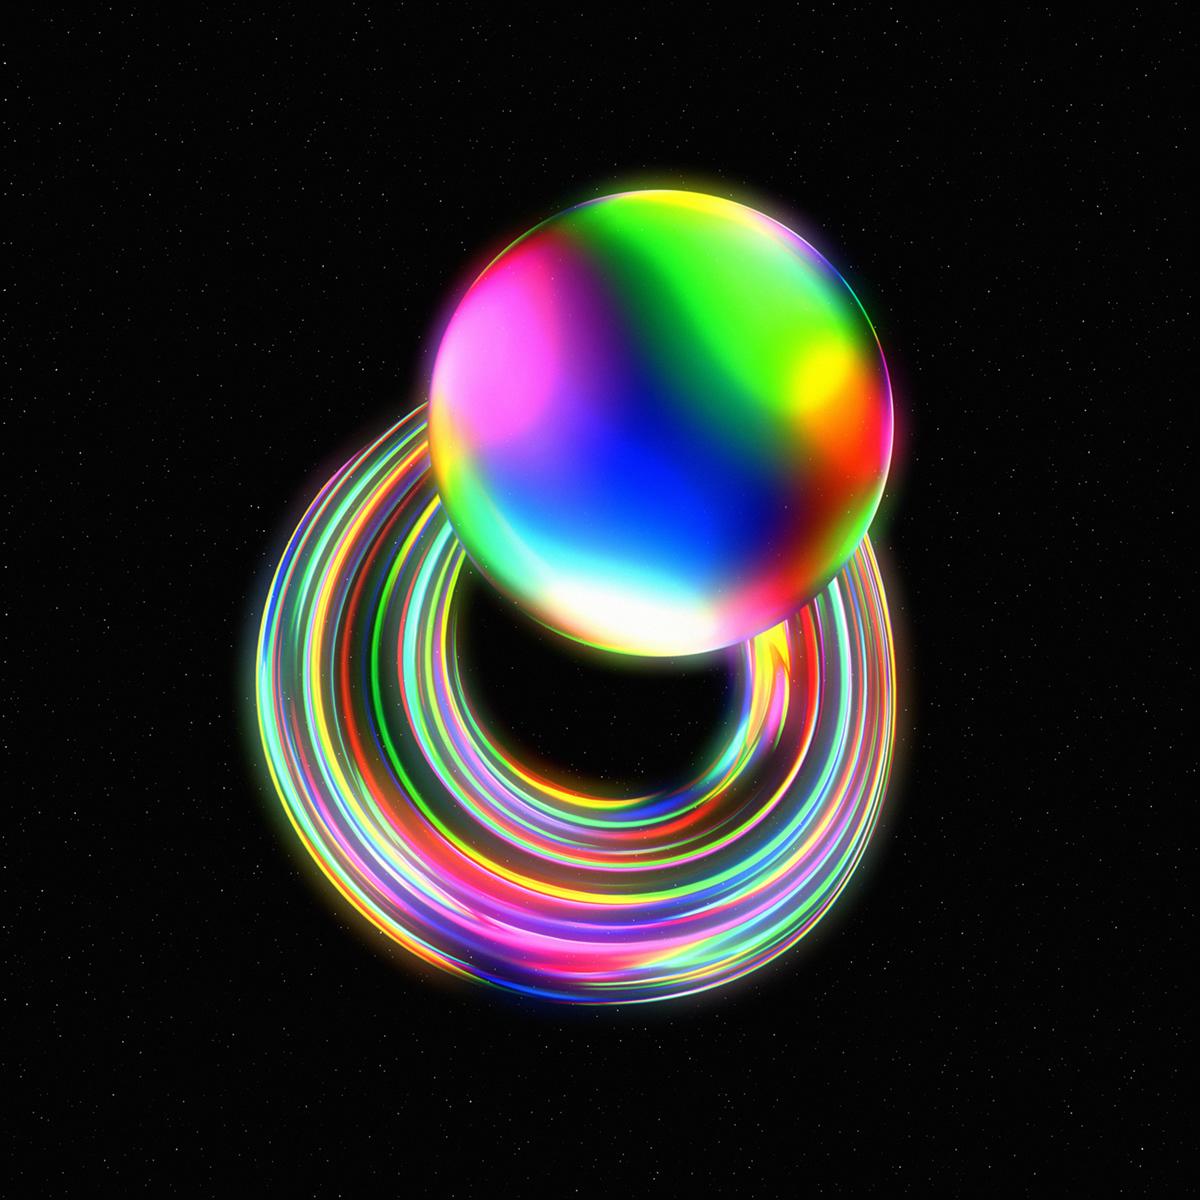 Image may contain: bubble, abstract and circle